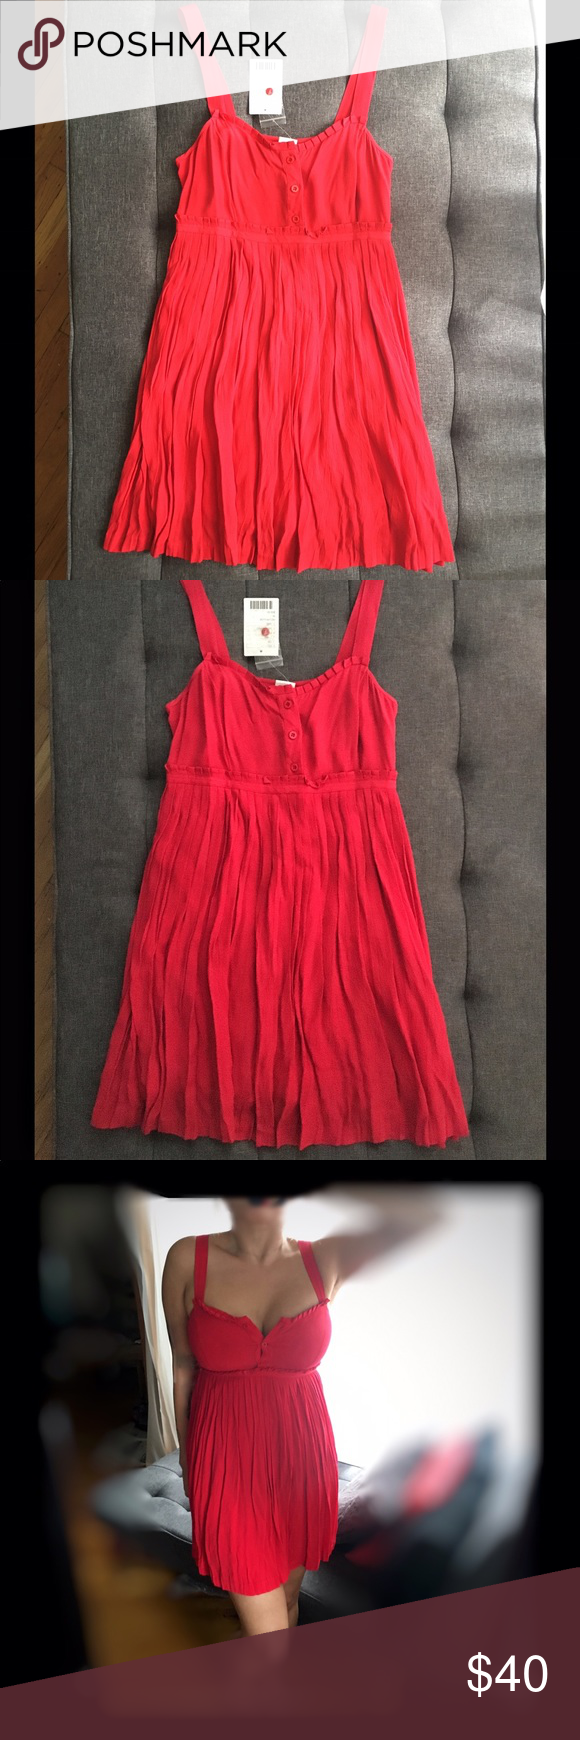 Cute red dress nwt brand new never worn red dress rayon u viscose